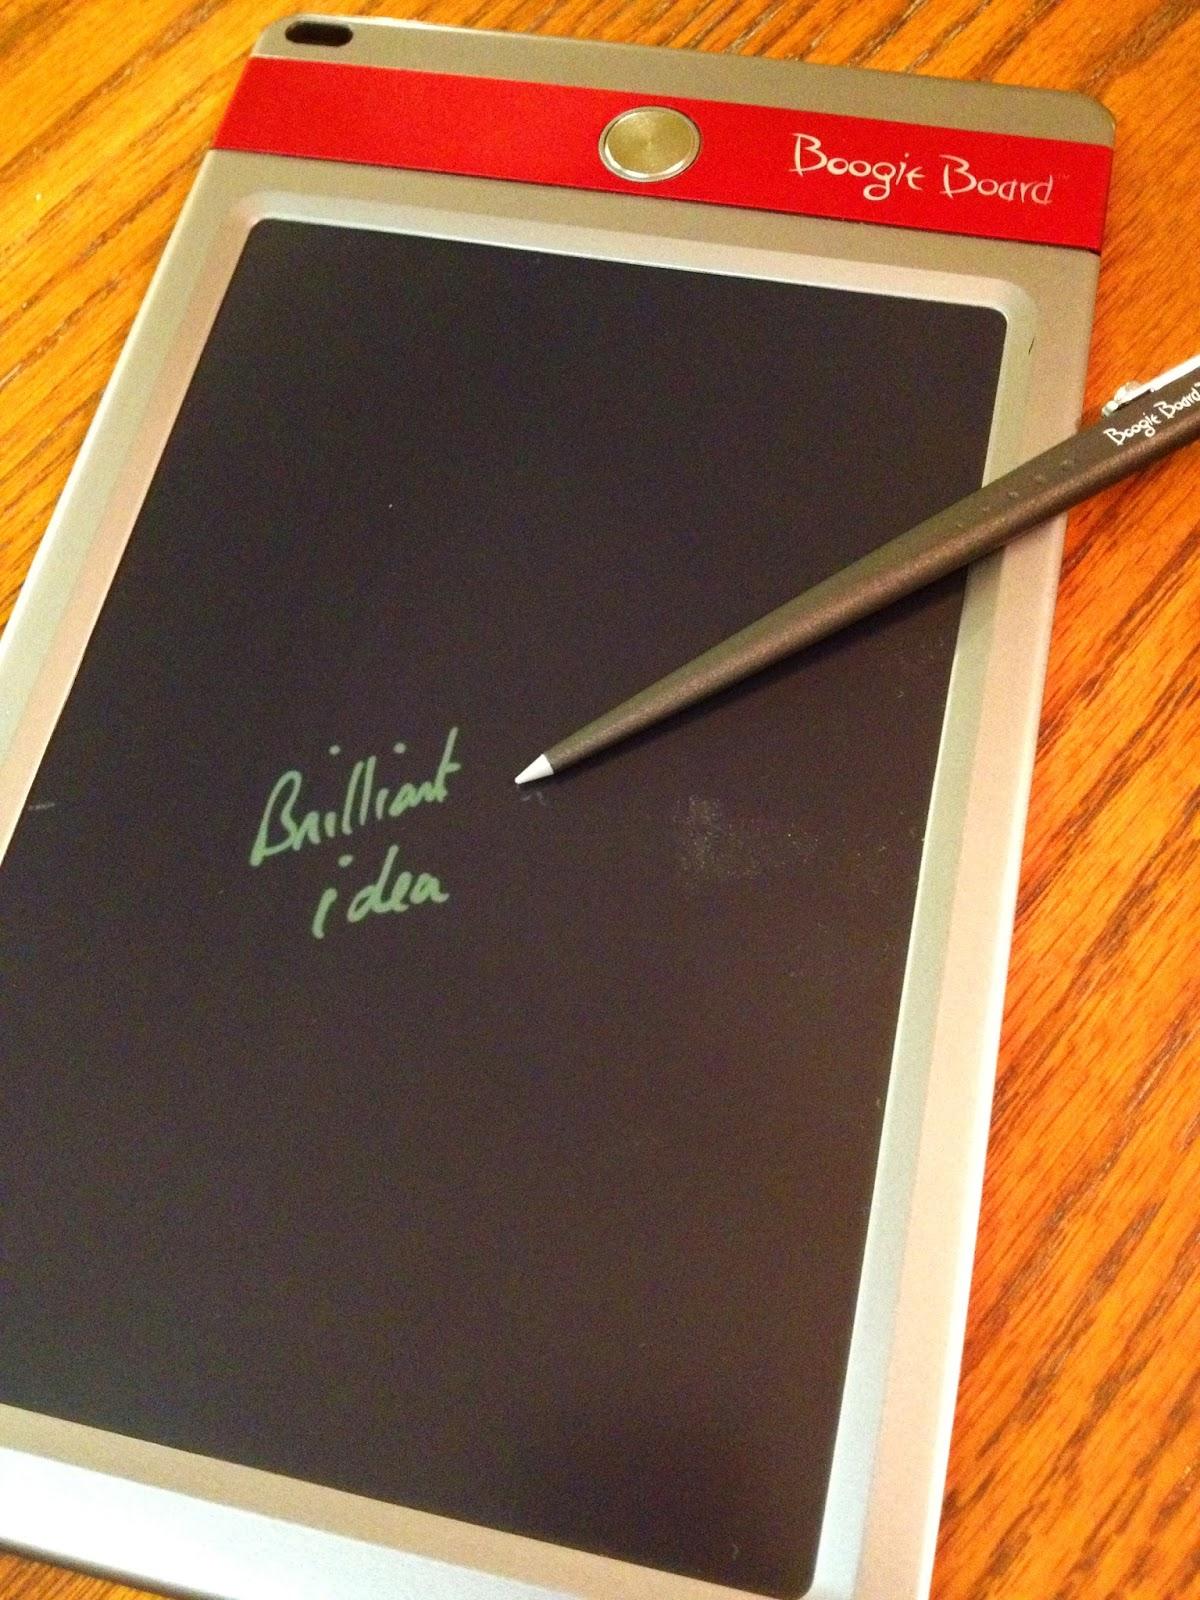 Writing on an ipad